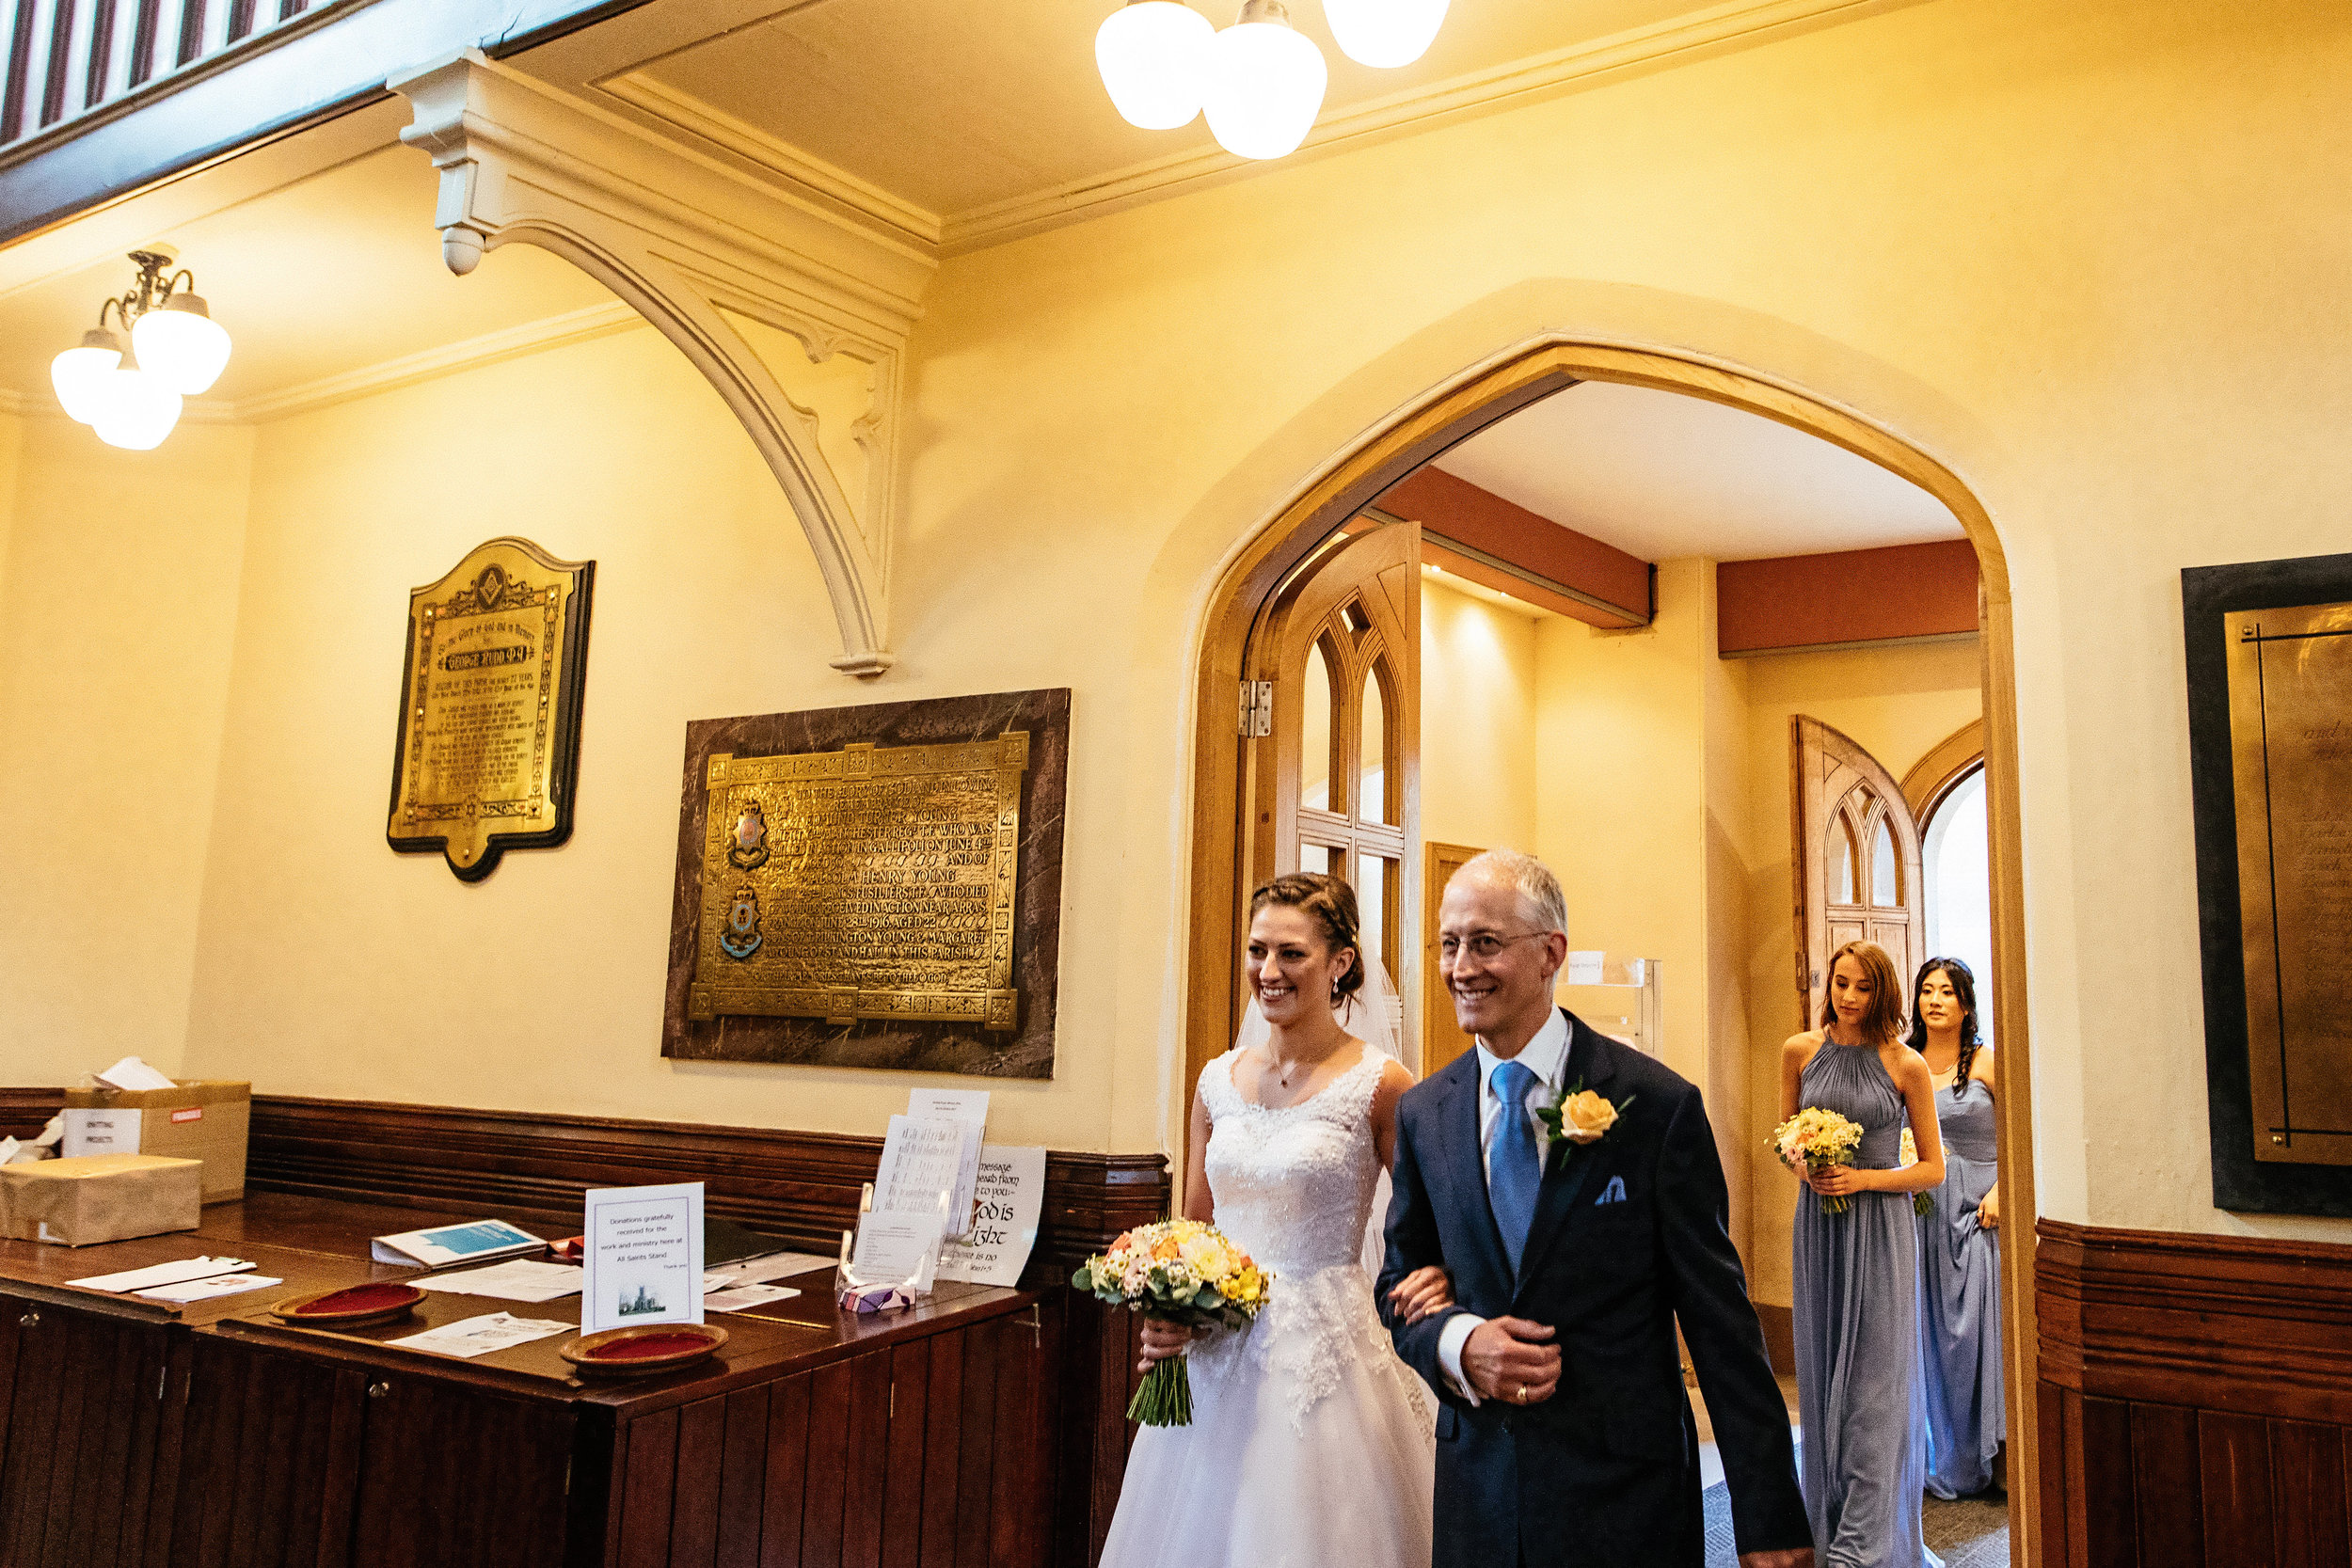 Kathryn-and-Mike-Wedding-Highlights-17.jpg